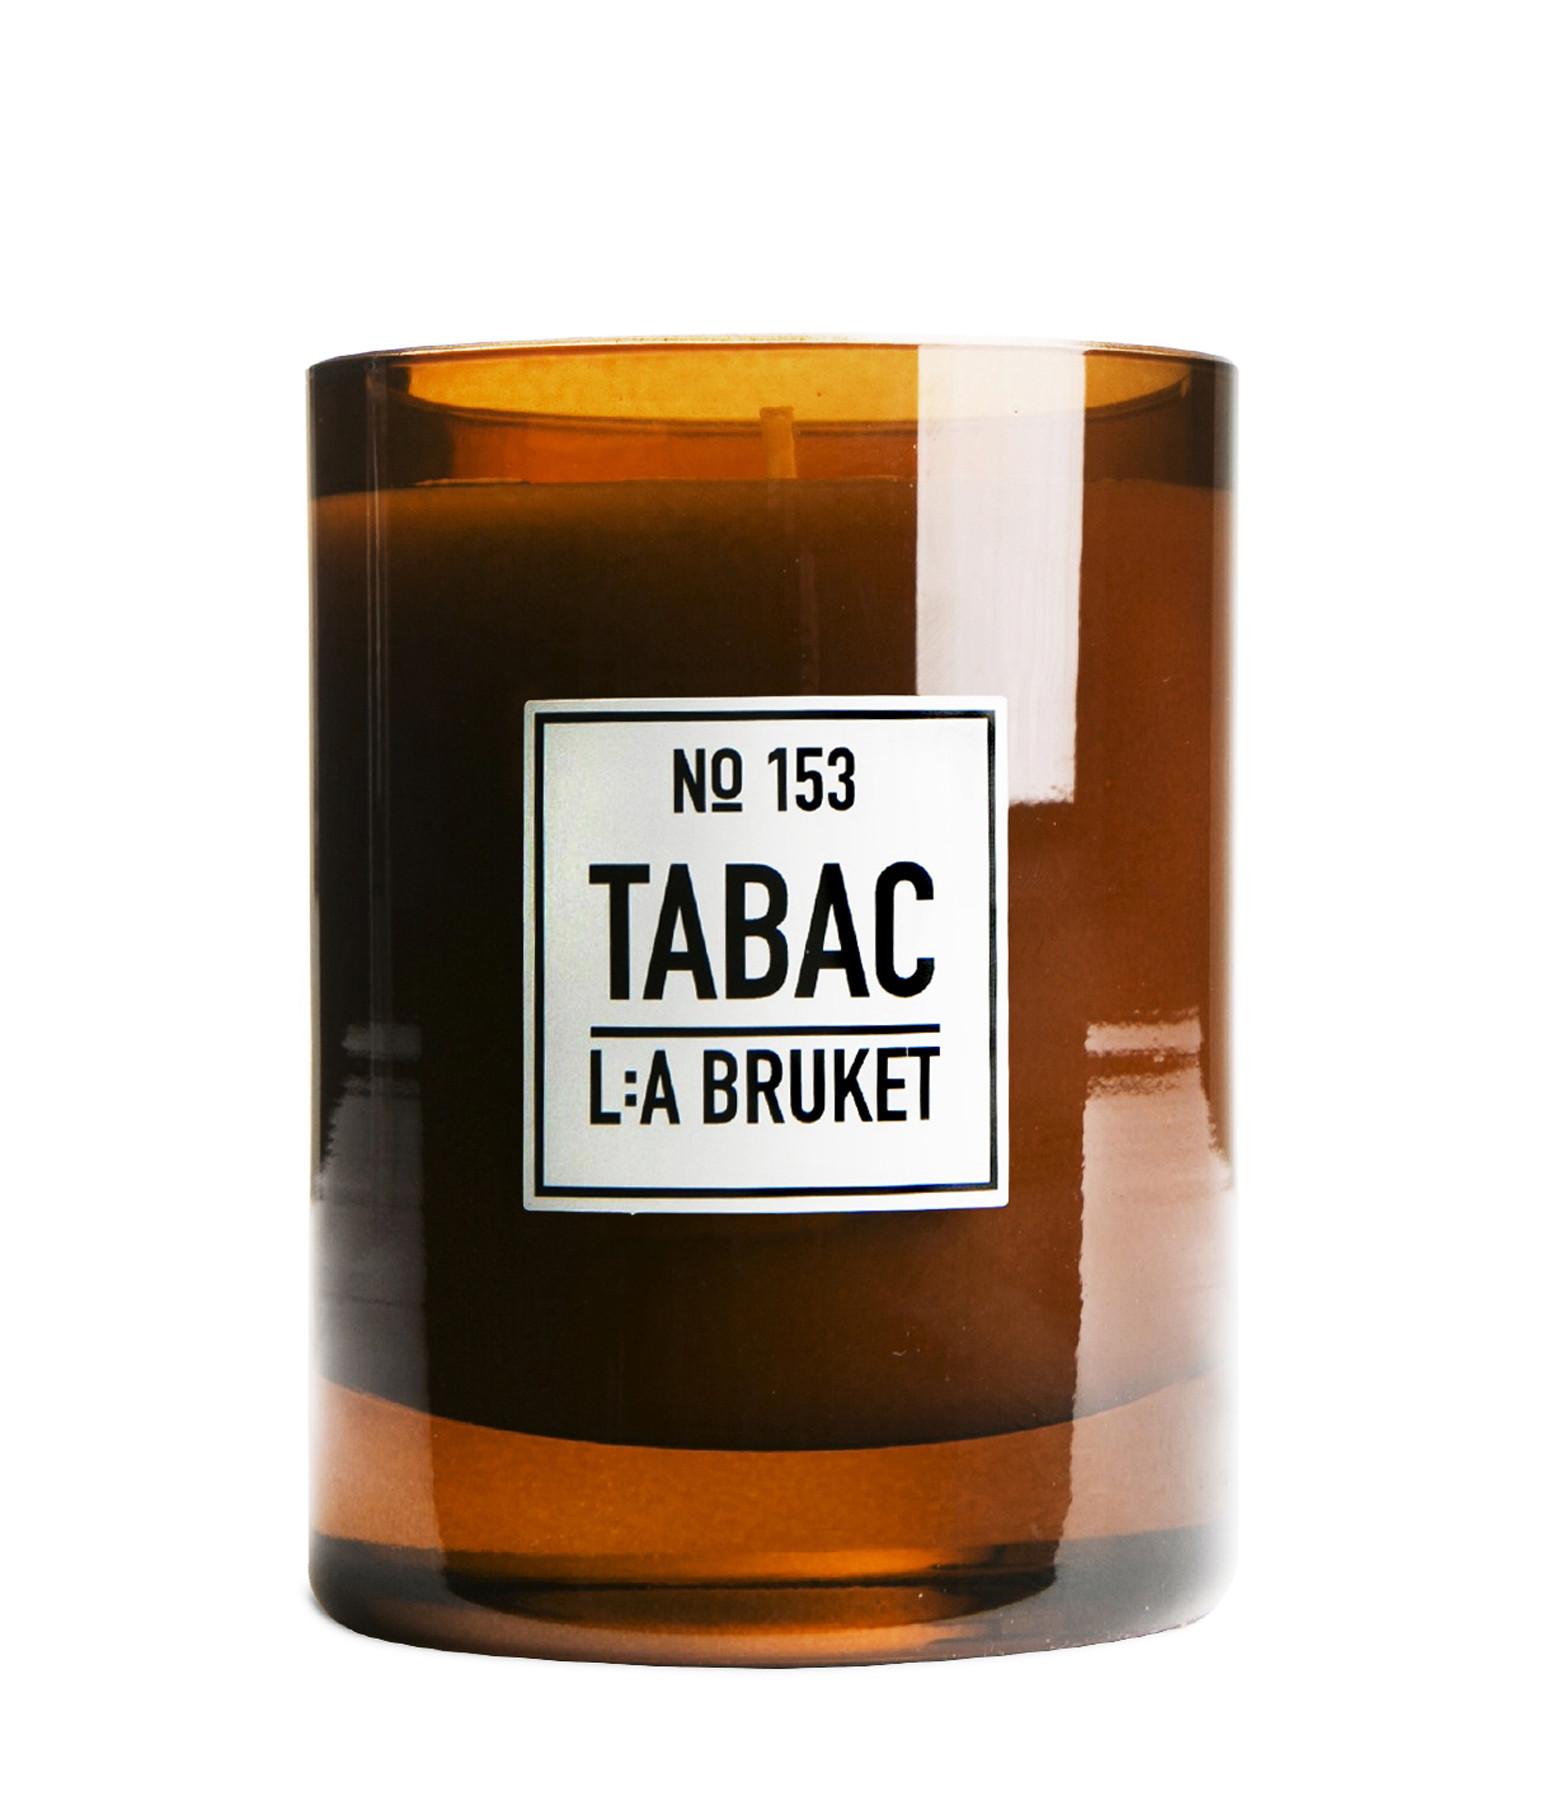 L:A BRUKET - Bougie Parfumée Tabac 260g N°153